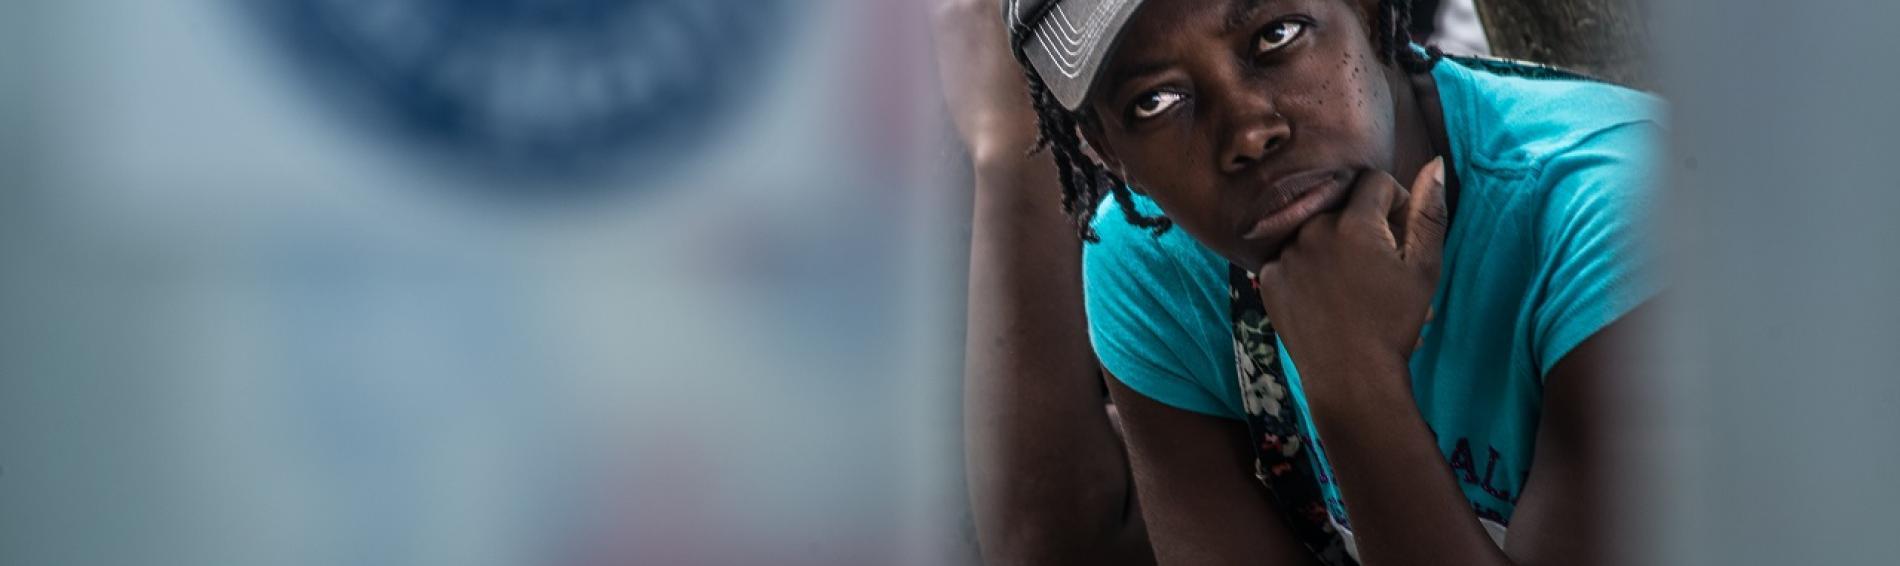 imagen tomada en Haití por el fotógrafo Alex Zapico